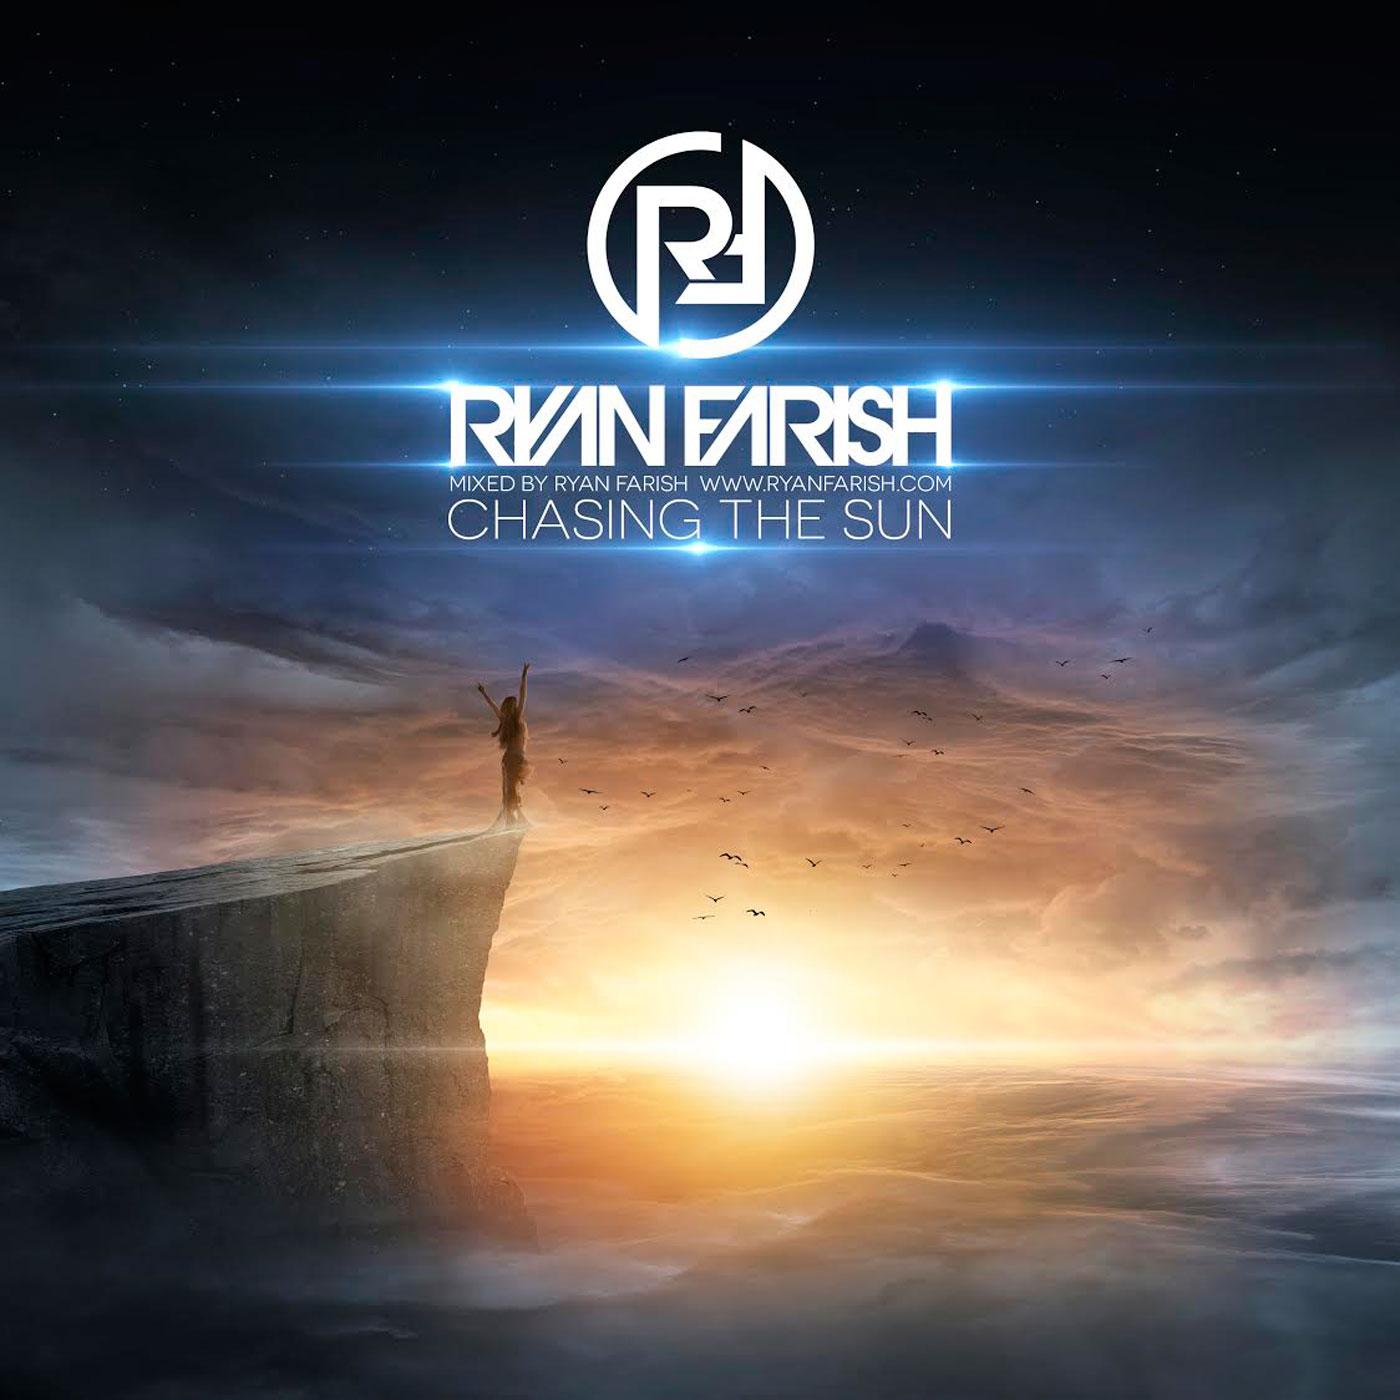 Ryan Farish: Chasing the Sun show image